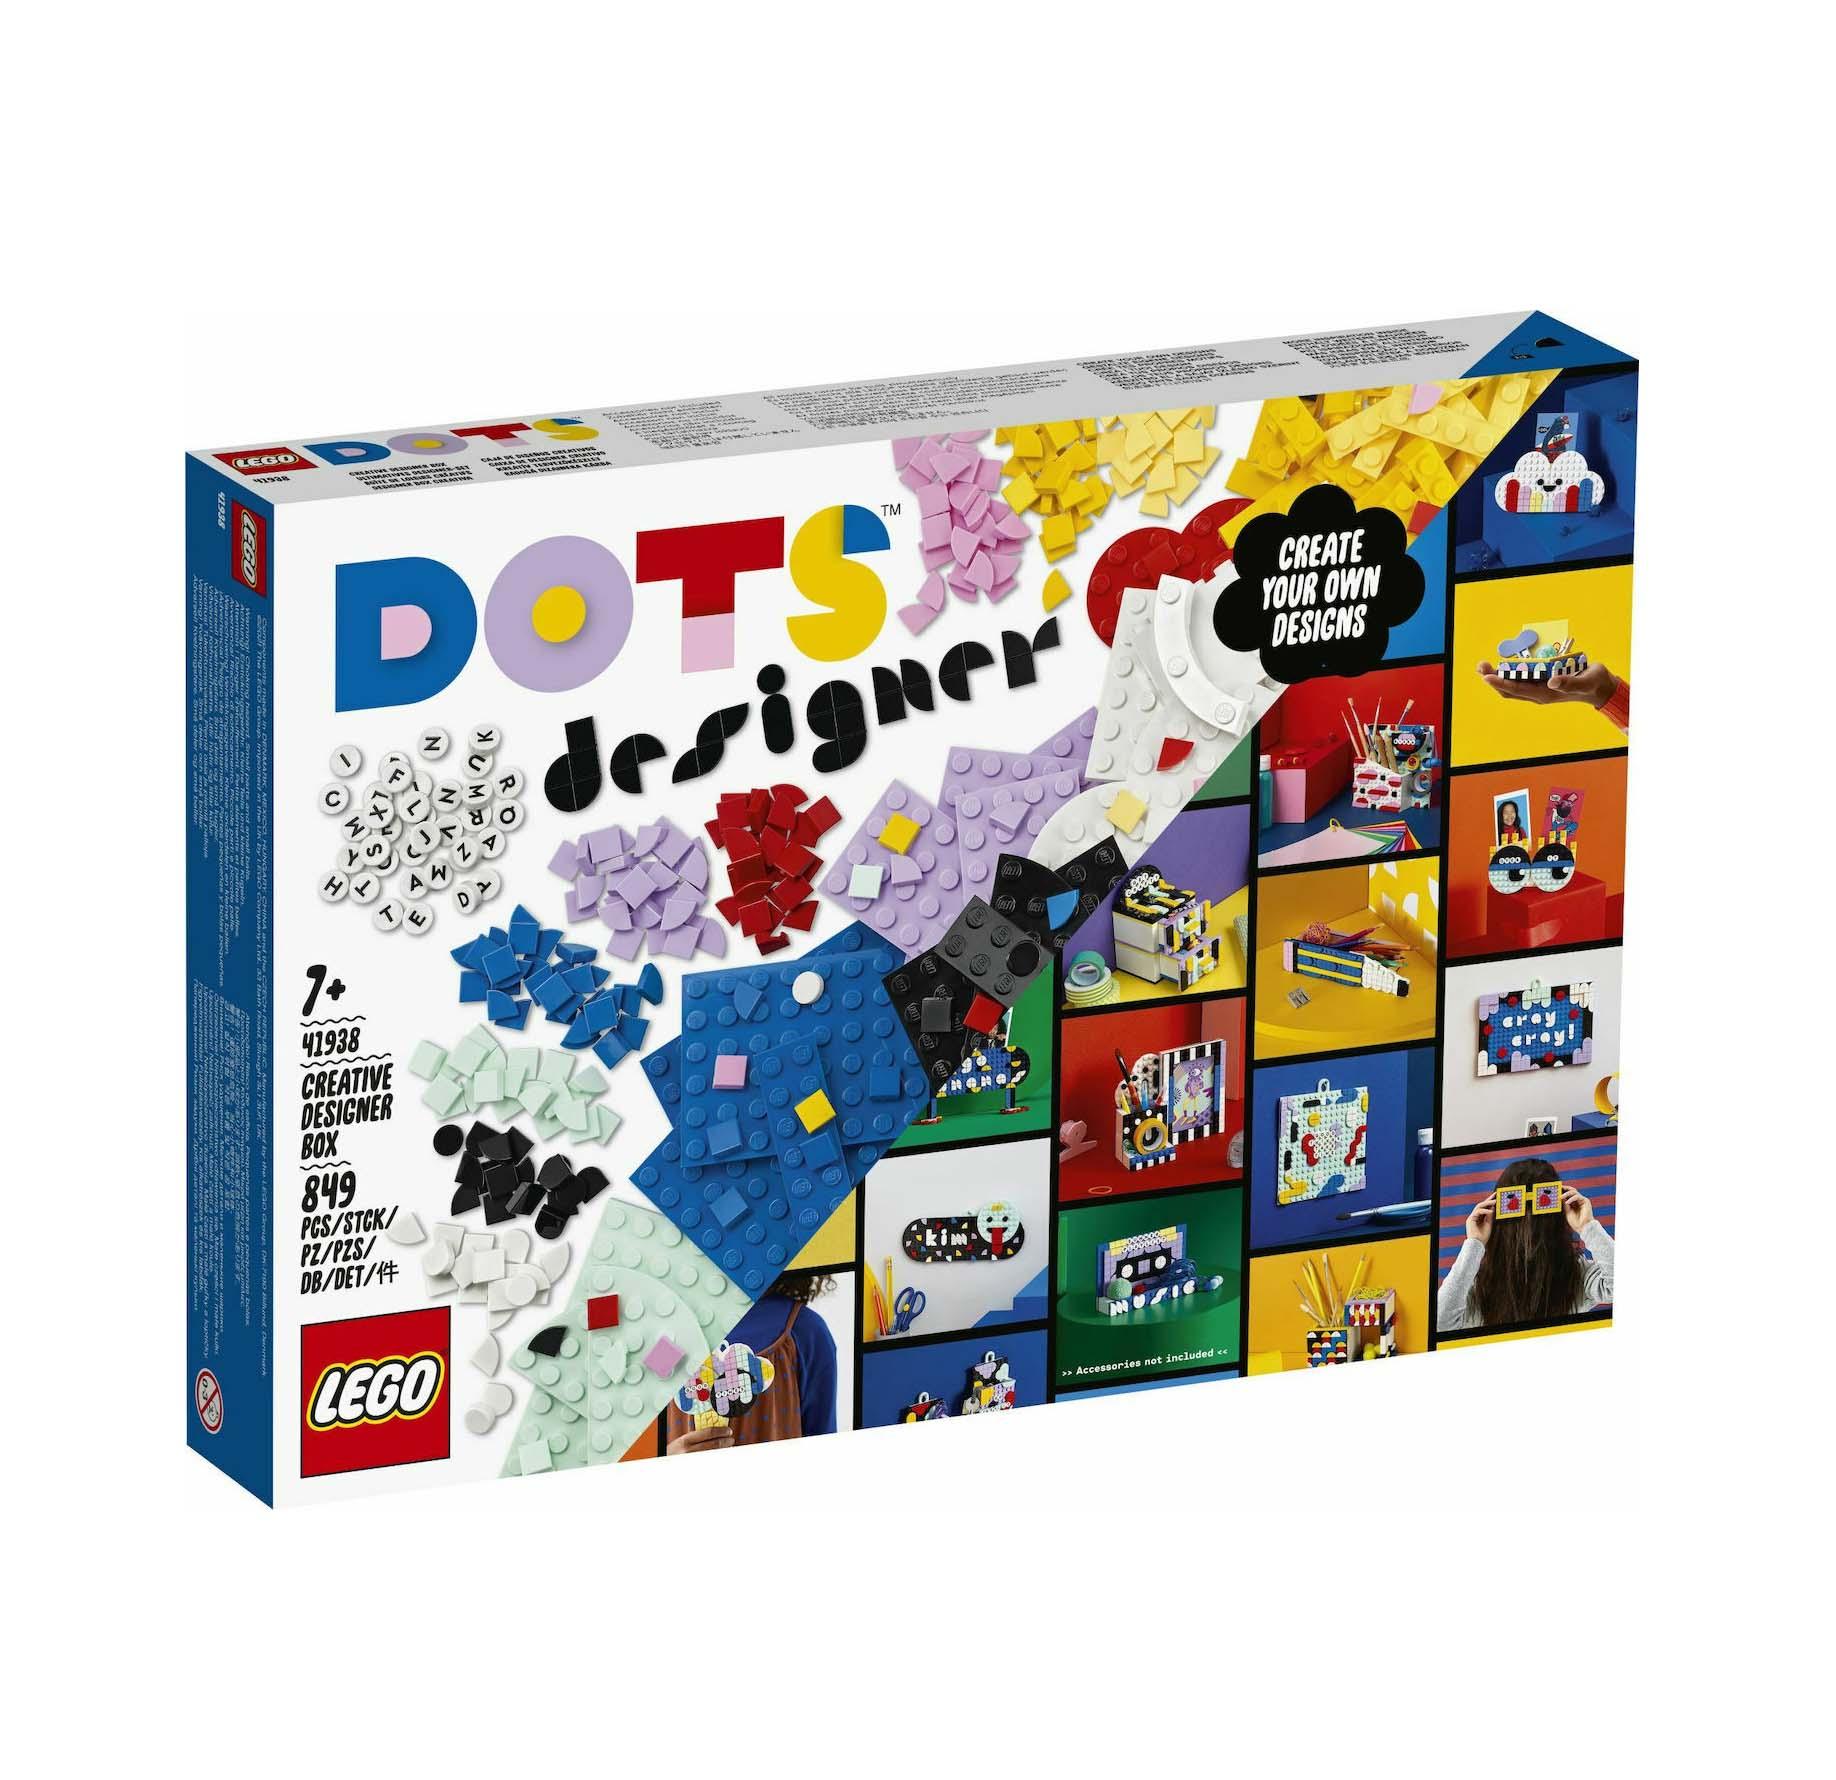 Lego Dots: Creative Designer Box 41938